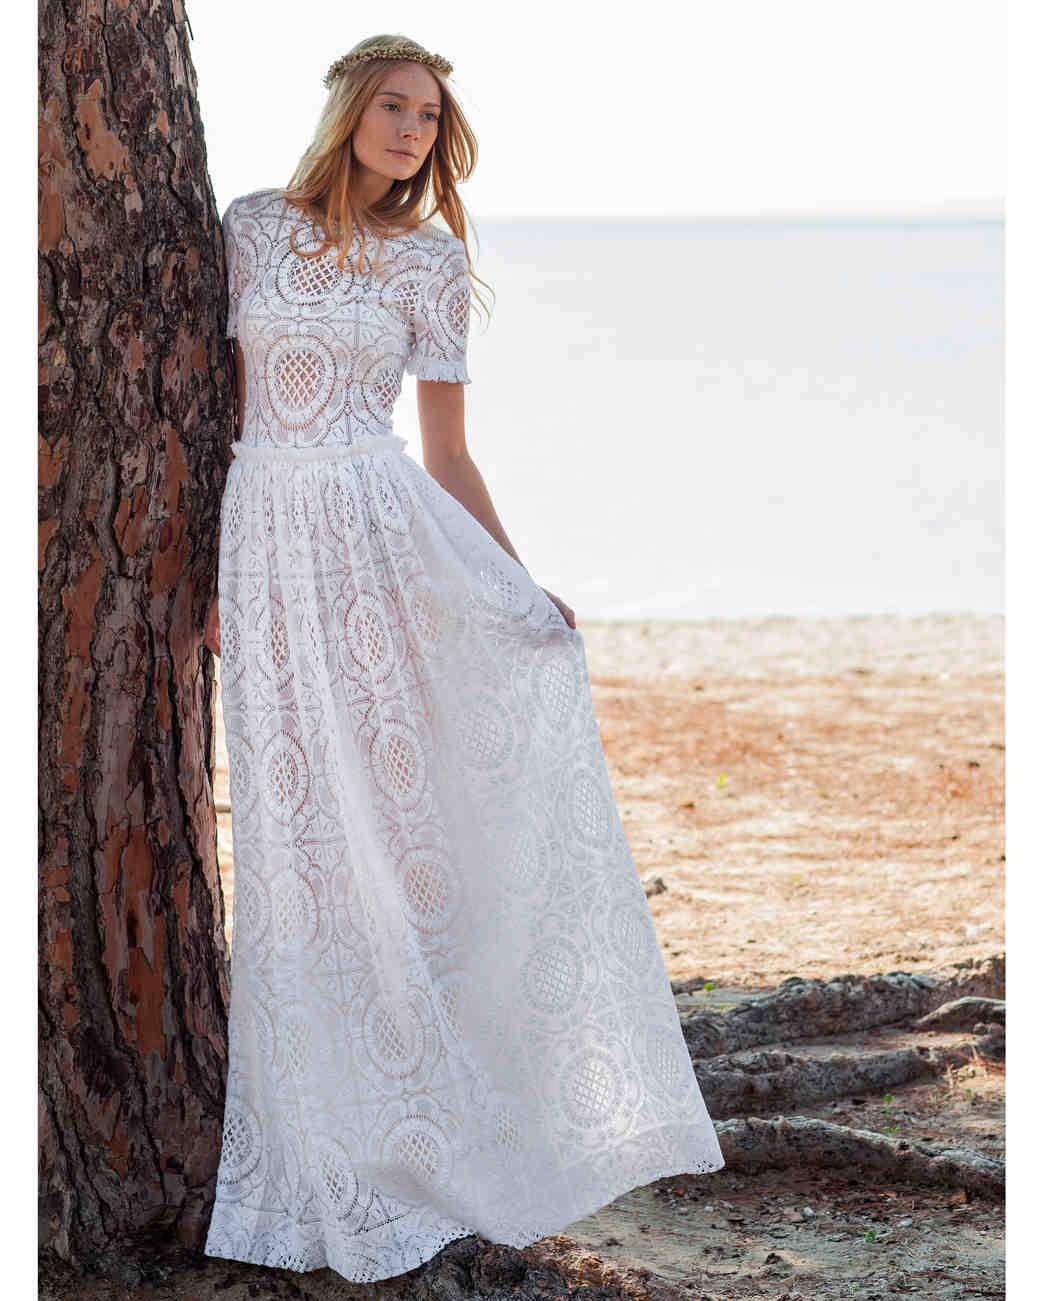 trends-lattice-costarellos-fall2016-wedding-dress-16-11-1015.jpg